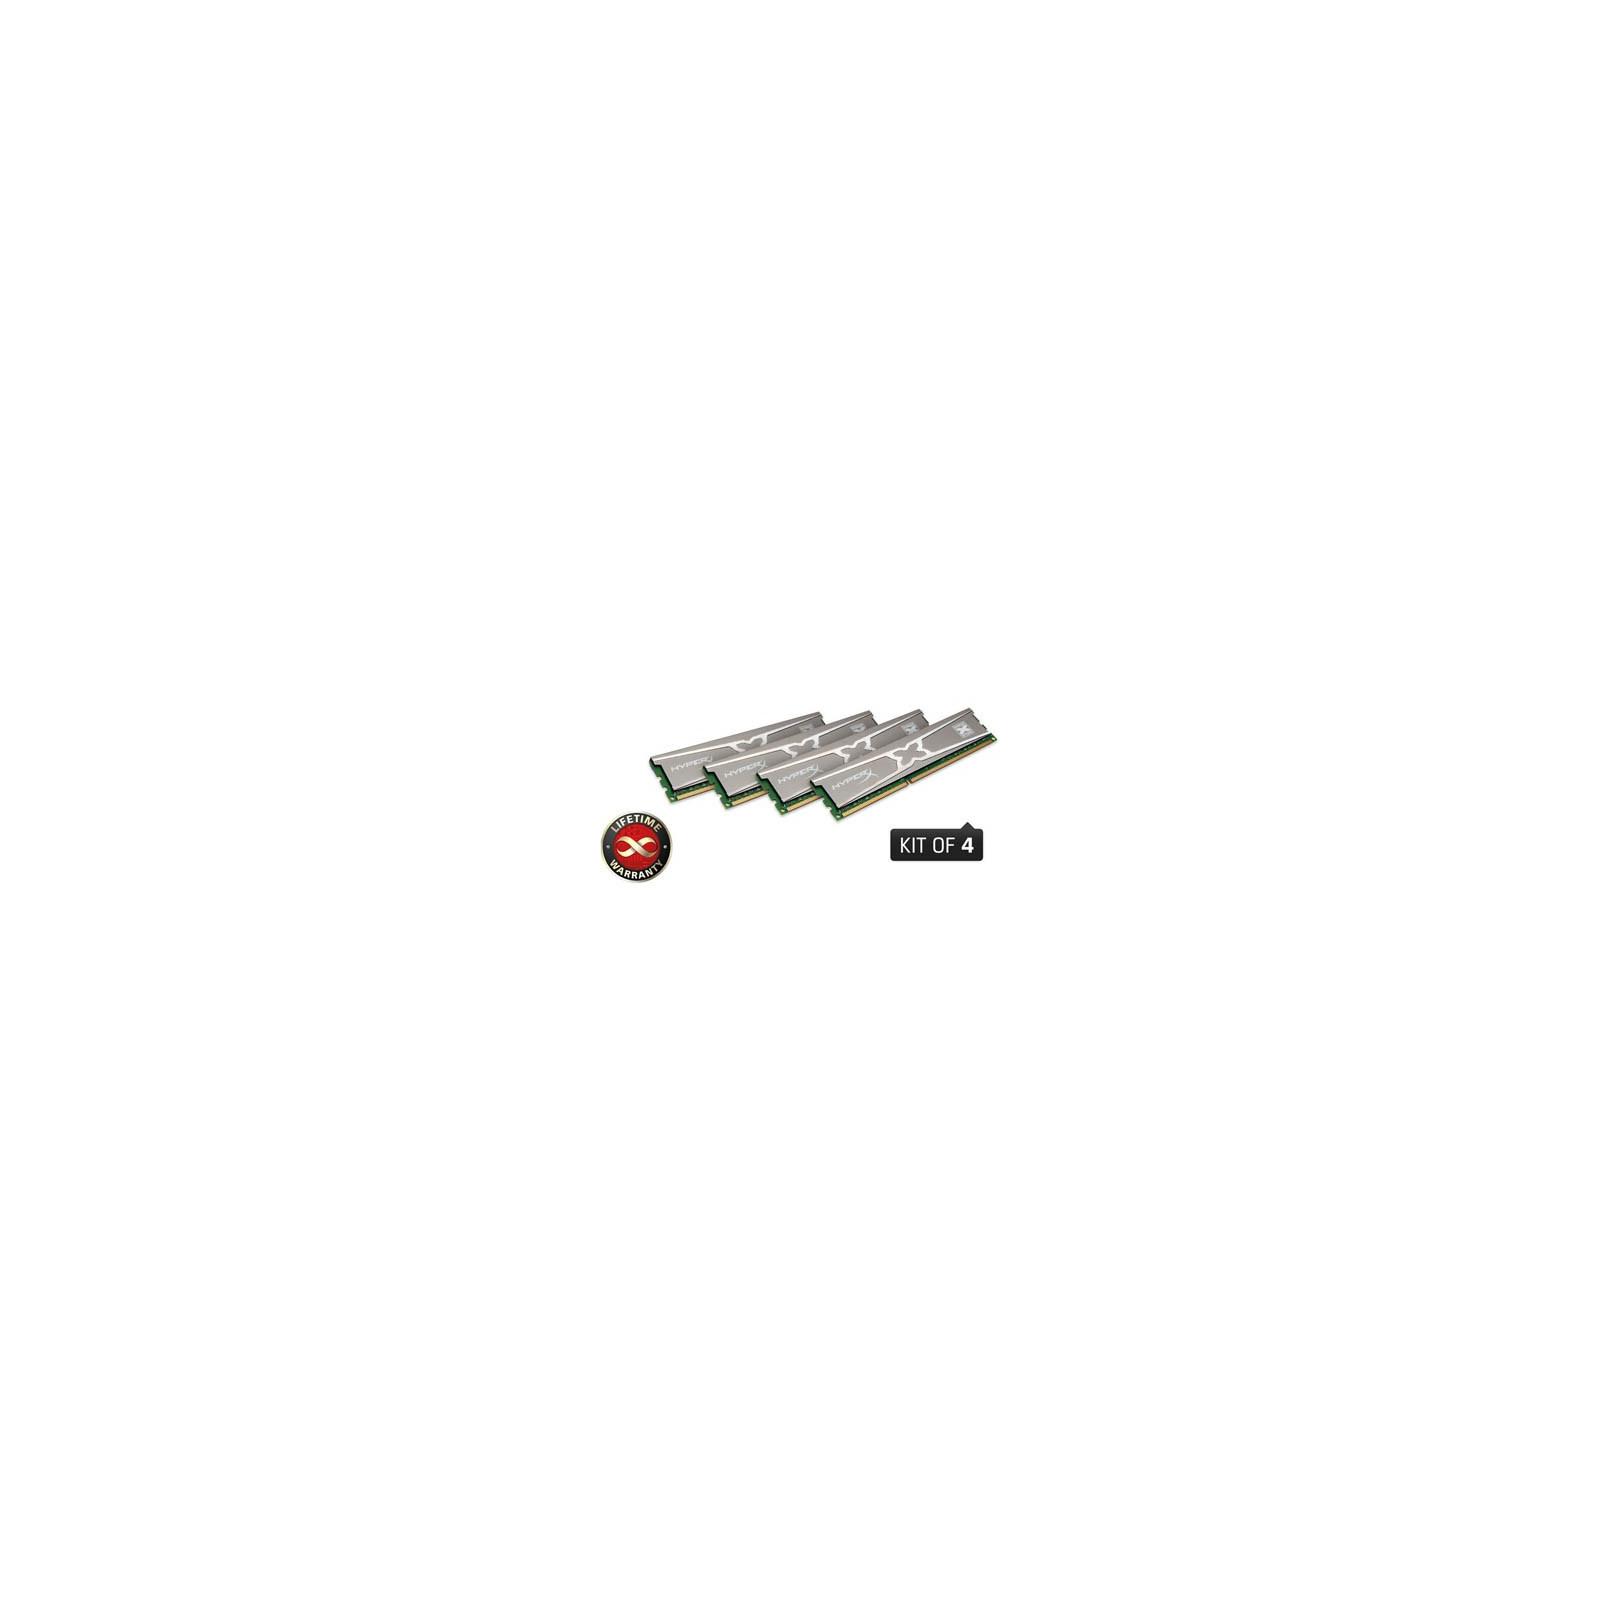 Модуль памяти для компьютера DDR3 16GB (4x4GB) 2400 MHz Kingston (KHX24C11X3K4/16X)